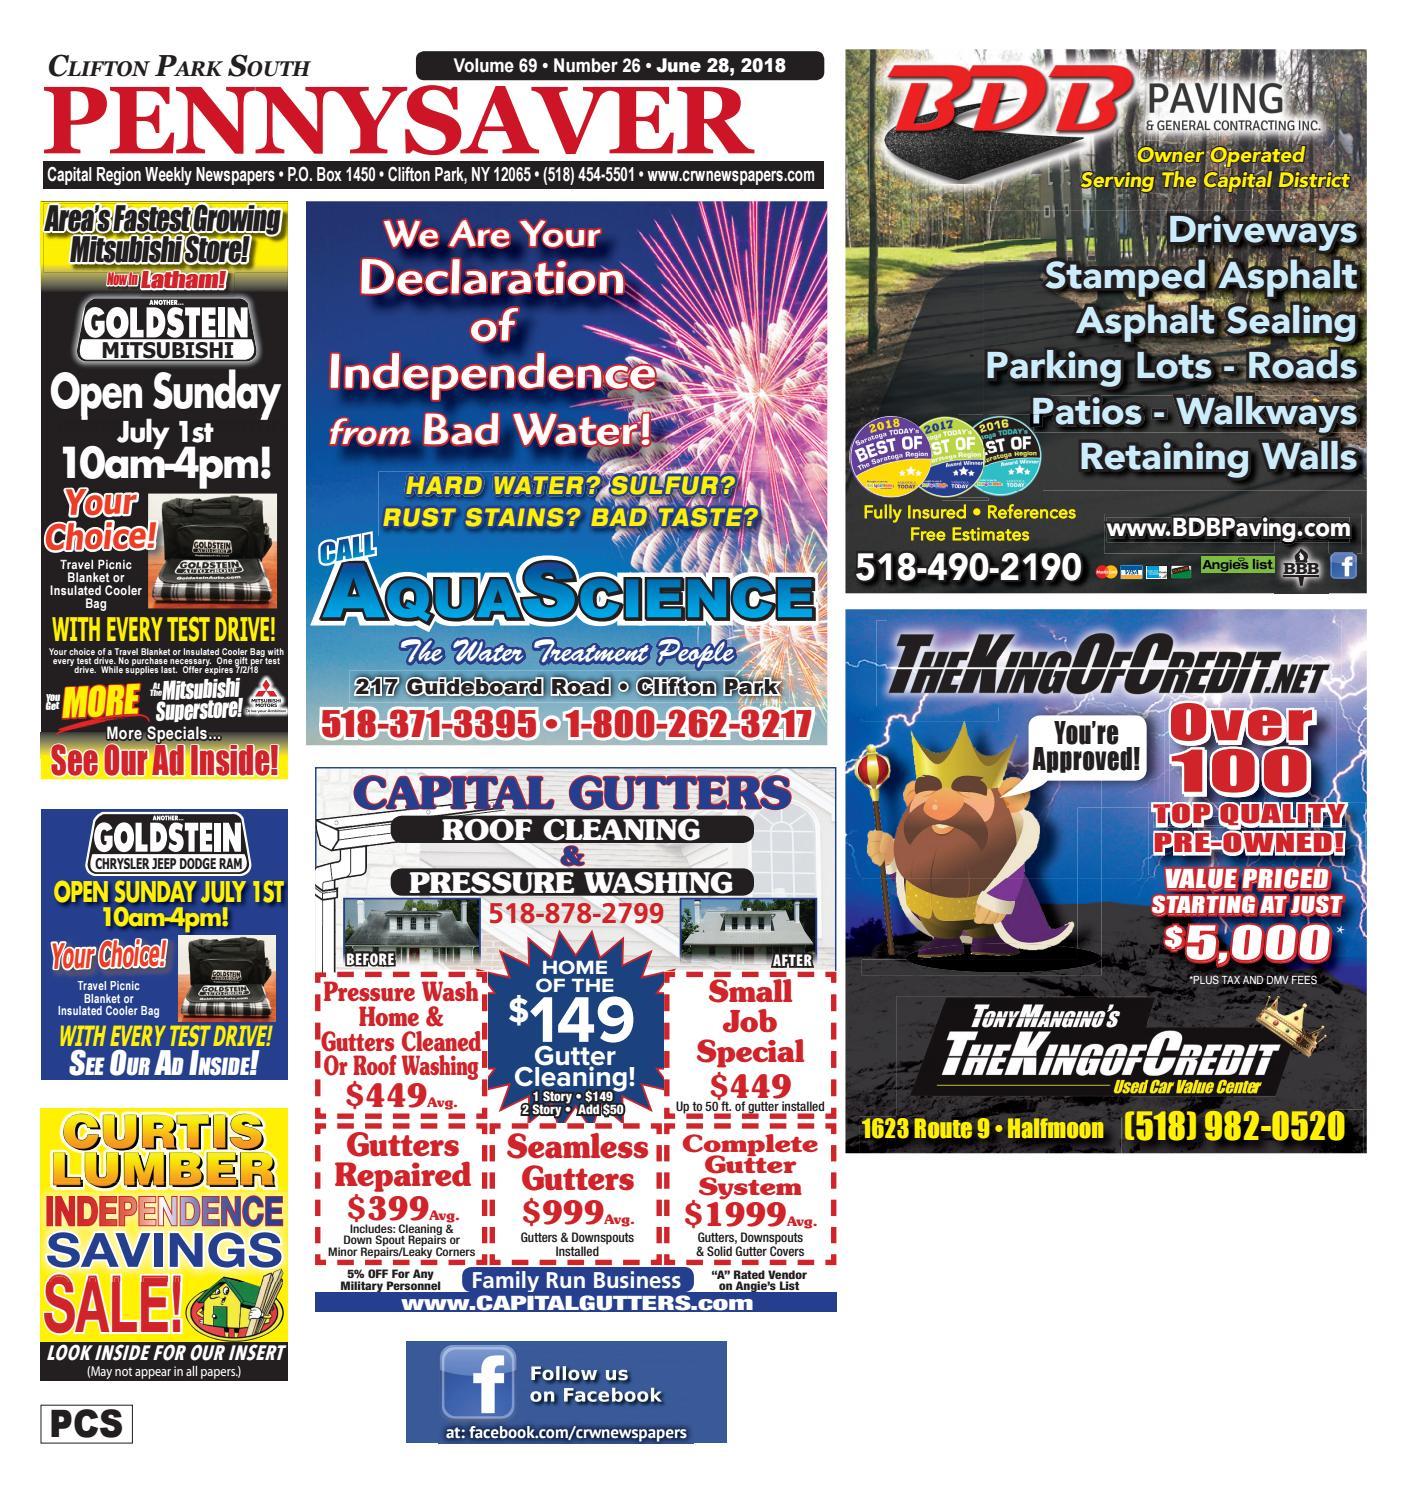 Clifton Park South Pennysaver 062818 By Capital Region